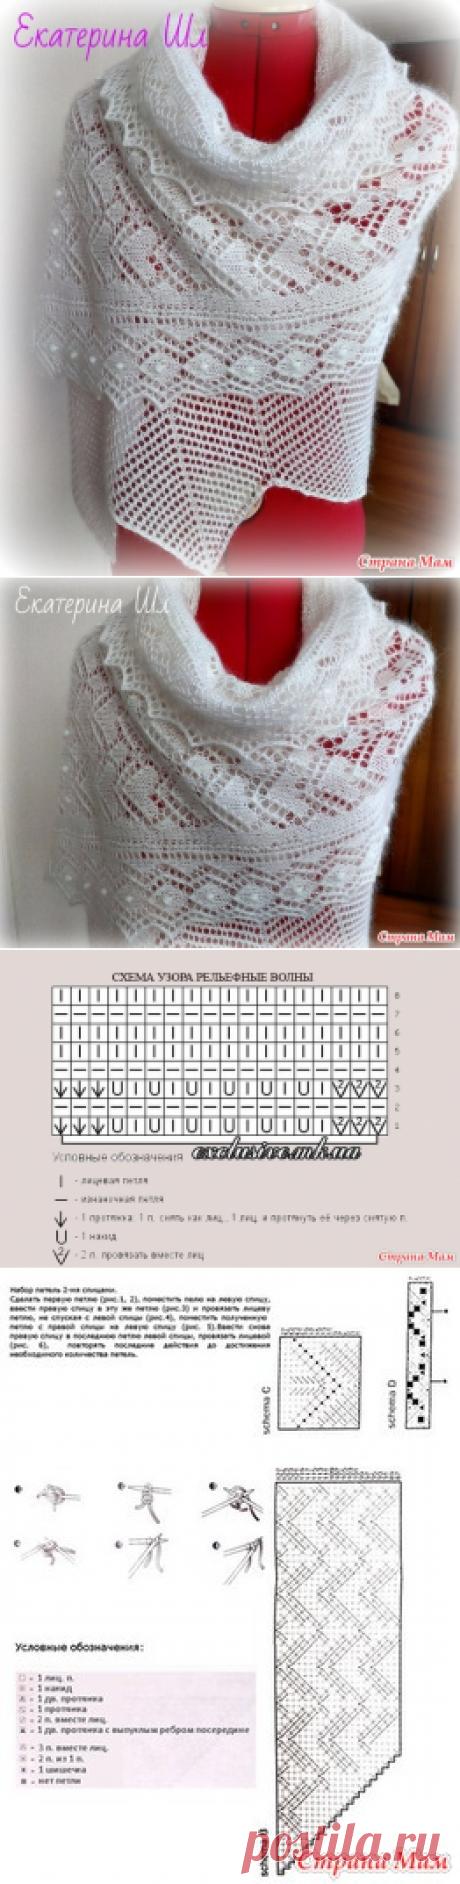 "Палантин ""Сердечки"". Белый шарф с каймой + описание. - Вязание - Страна Мам"